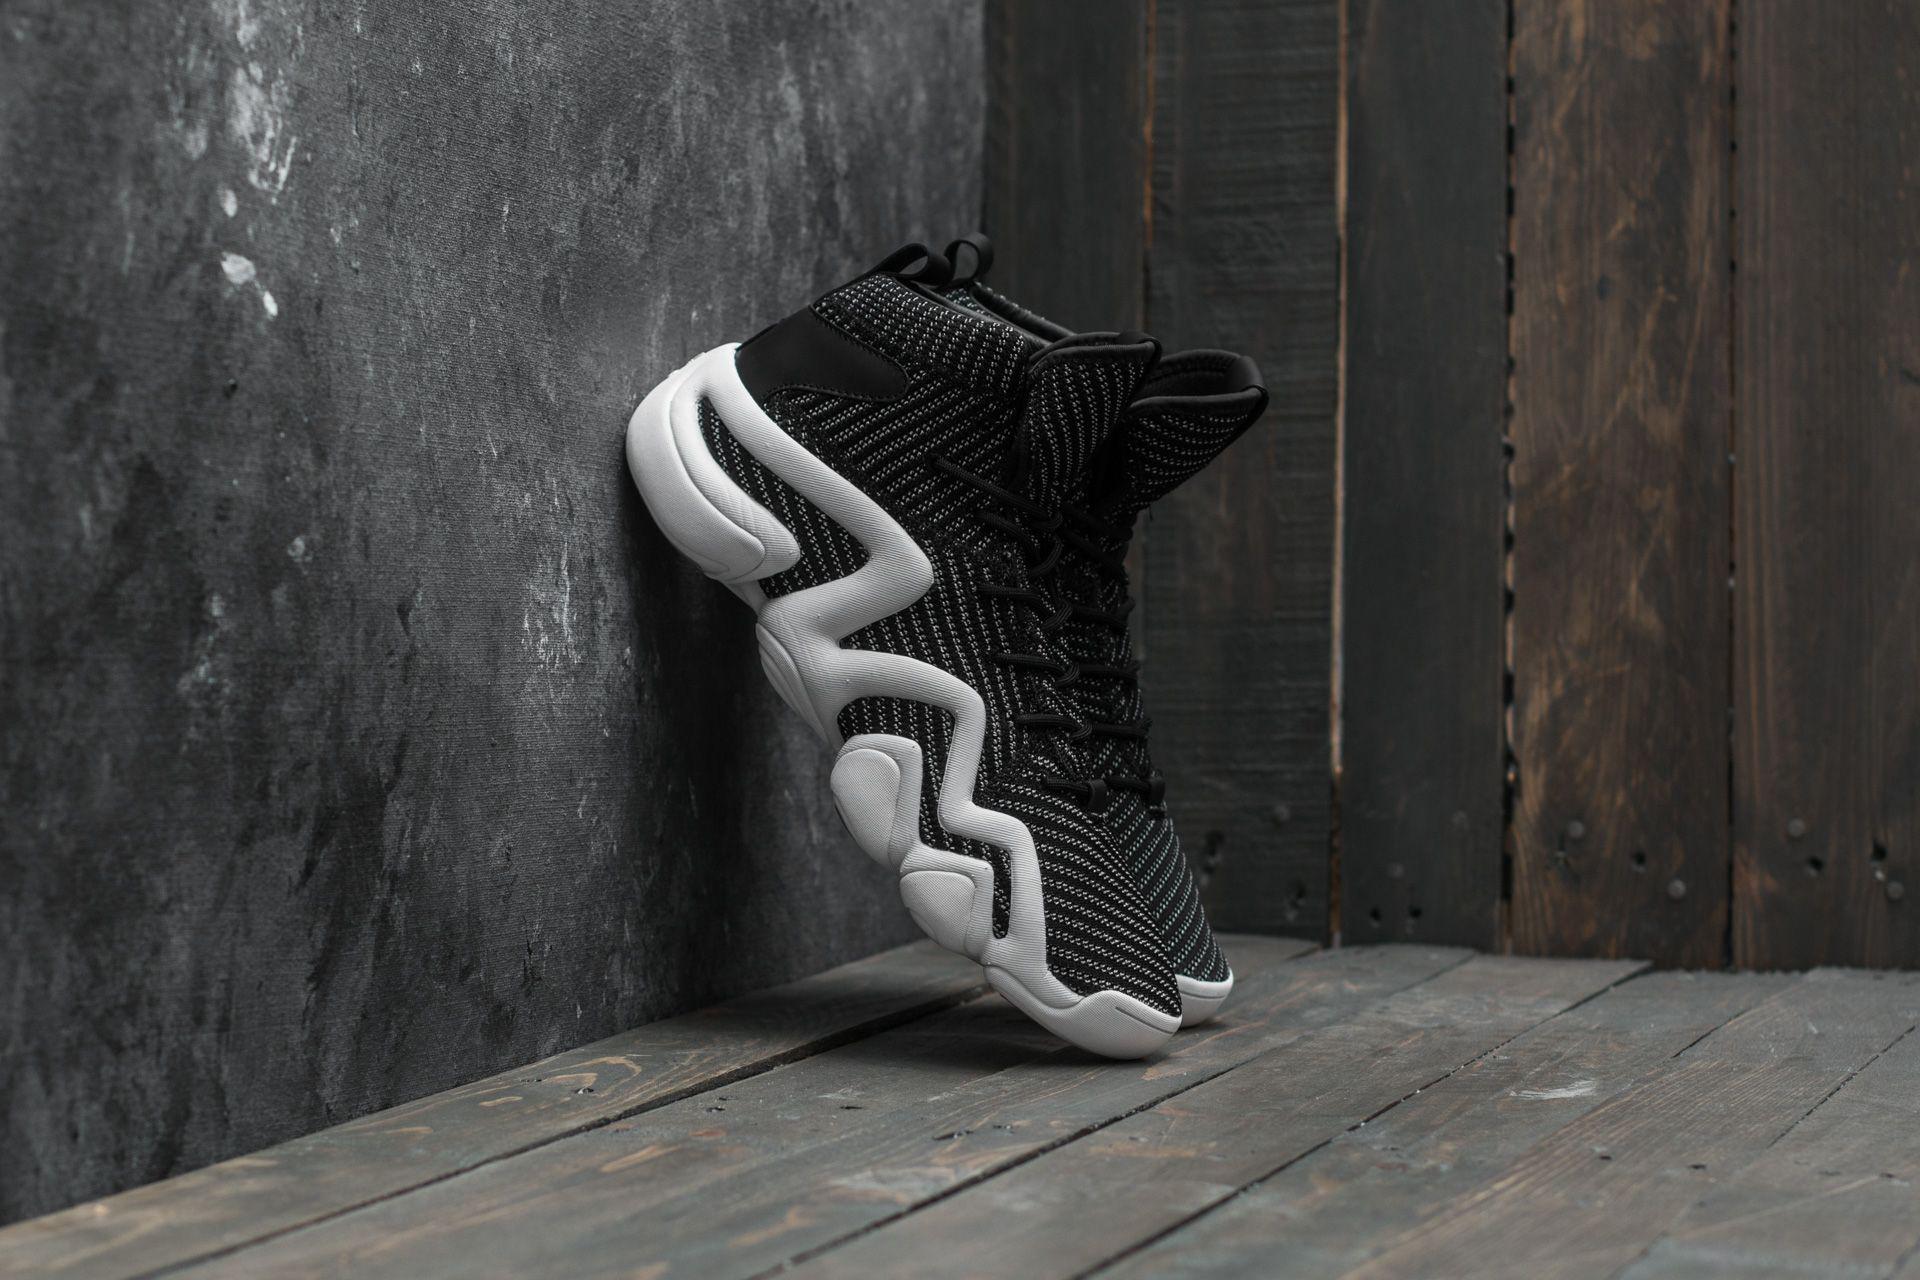 size 40 bd4a0 18503 Lyst - adidas Originals Adidas Crazy 8 Adv Primeknit Core Bl